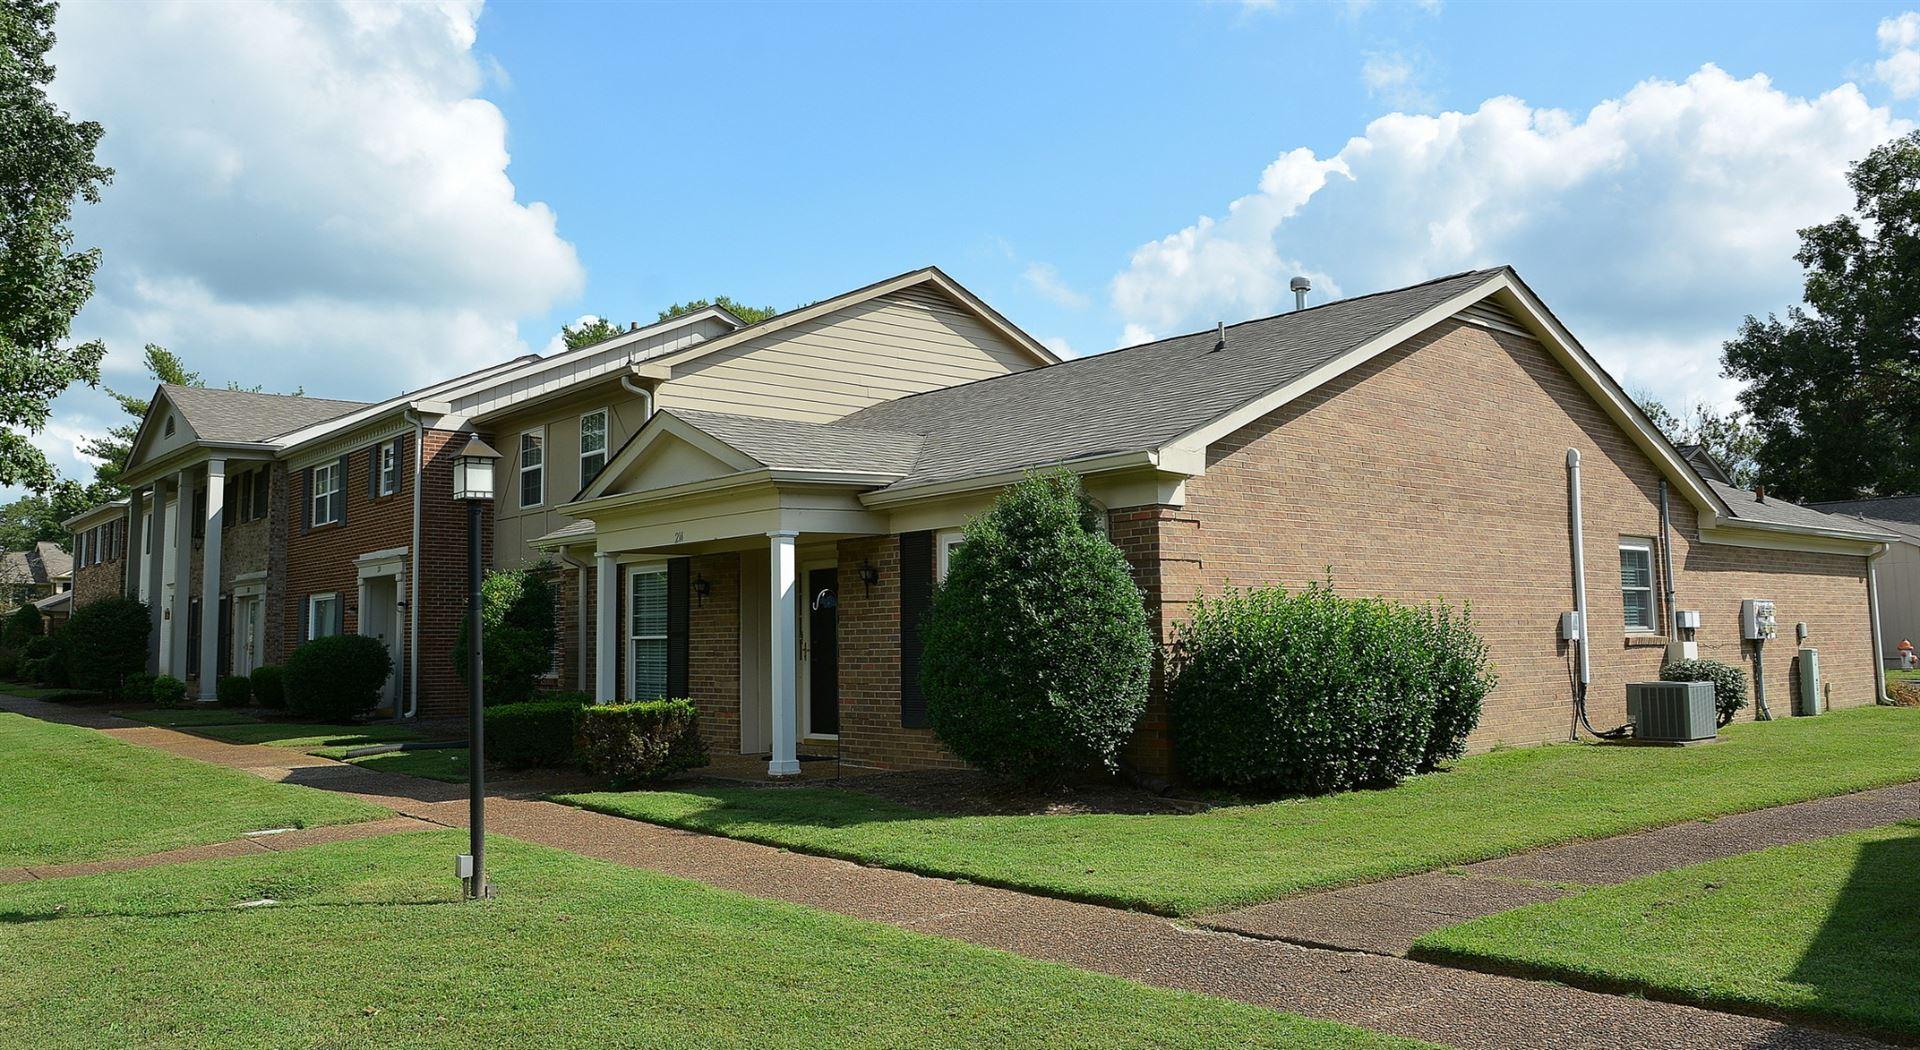 Photo of 212 Plantation Ct, Nashville, TN 37221 (MLS # 2193006)